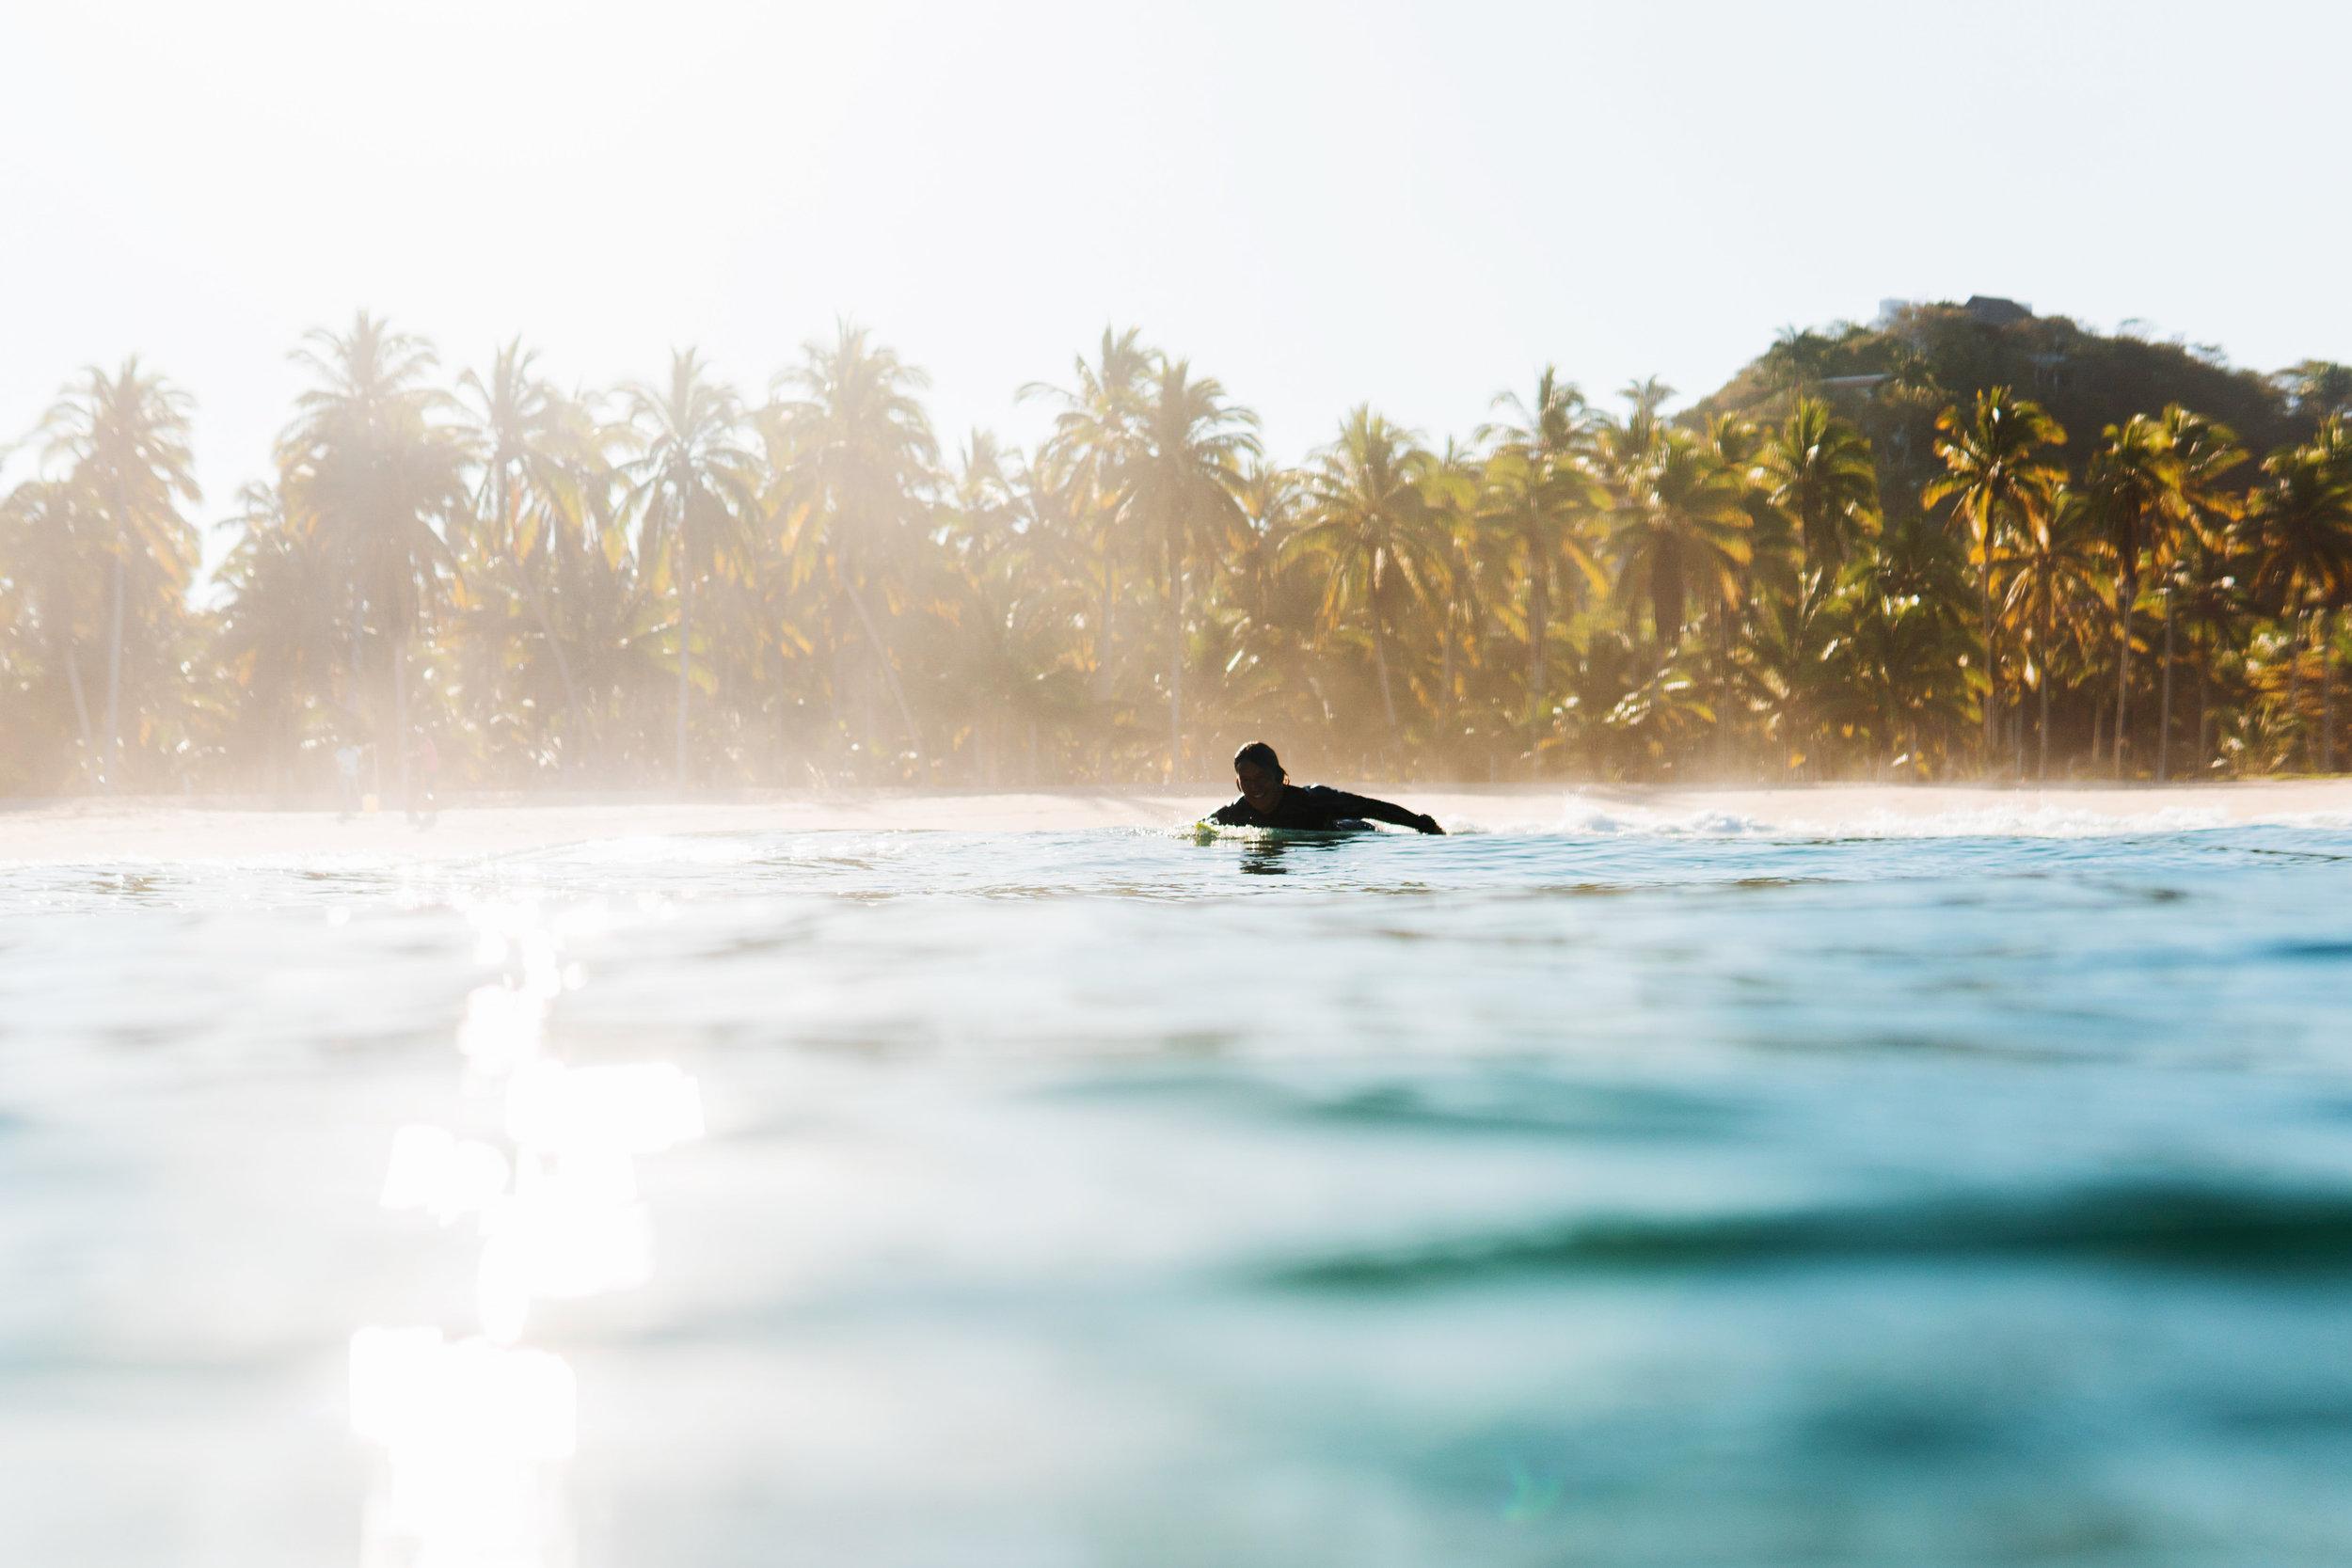 Surf-Mexico-Zihuatanejo-Sayulita-Ixtapa-Zihuatanejo-Diego-Cadena-Olas-Fotografia-Heiko-Bothe-64.jpg